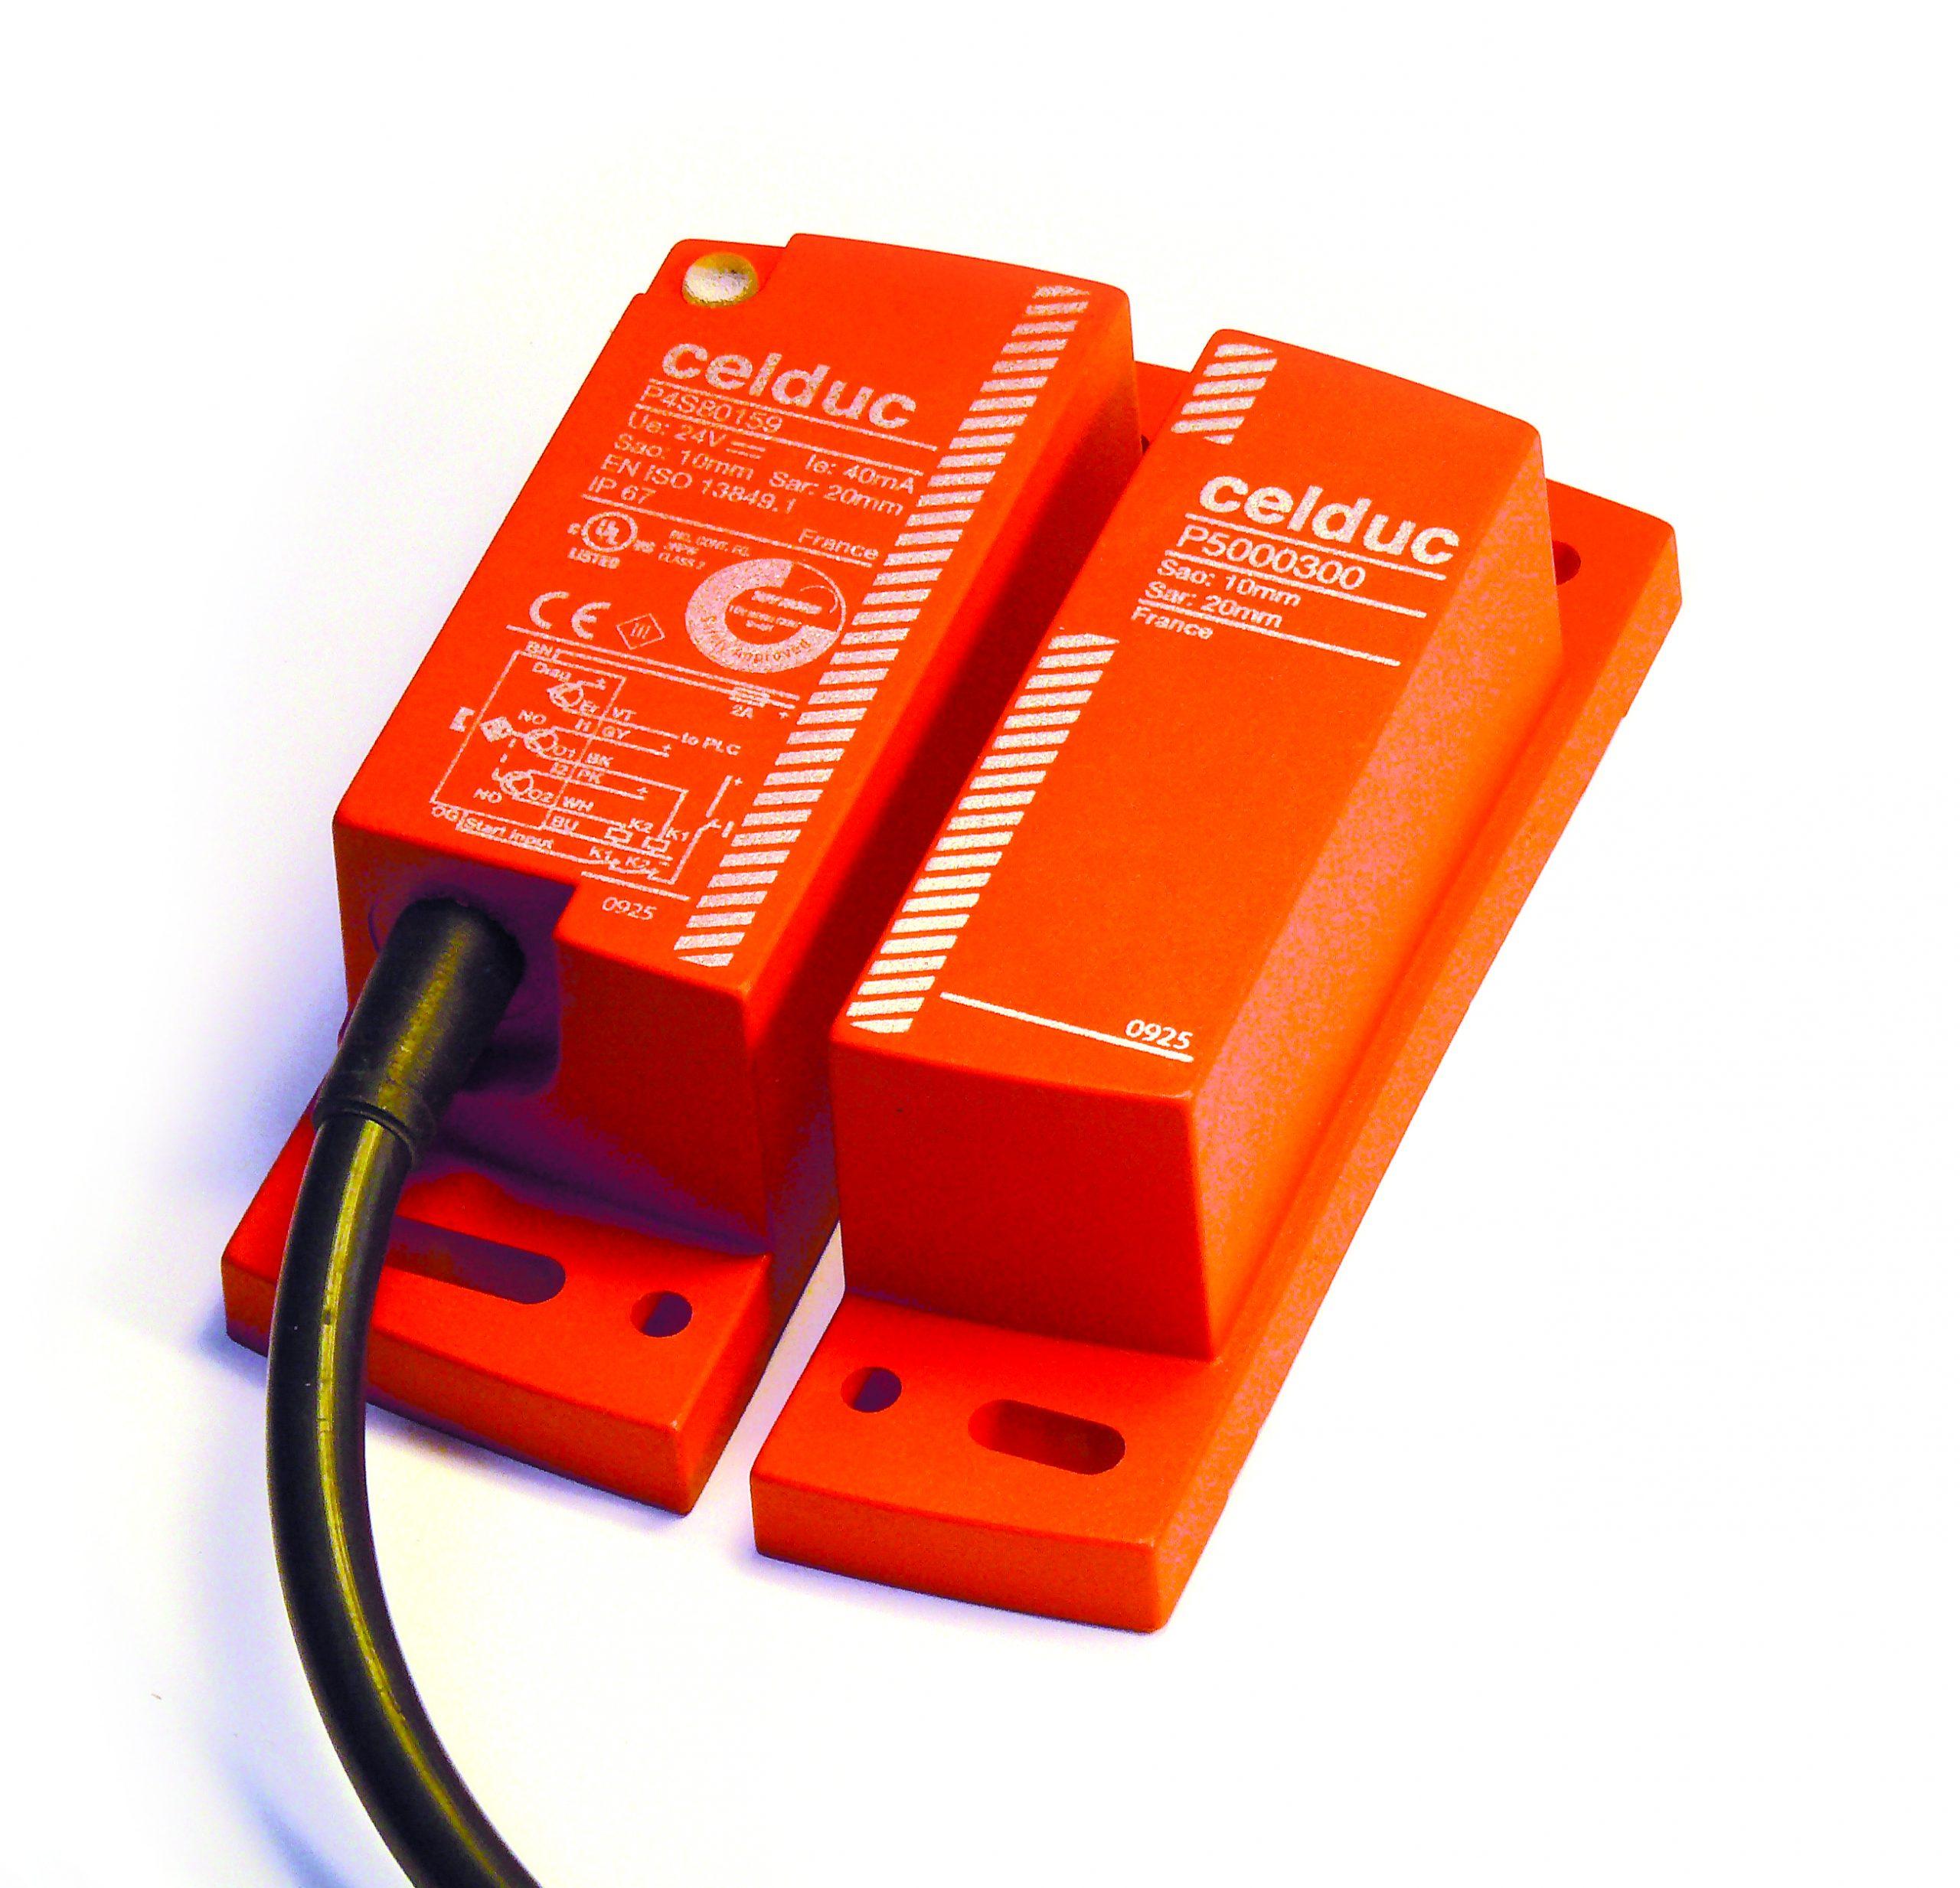 P3S range sensors